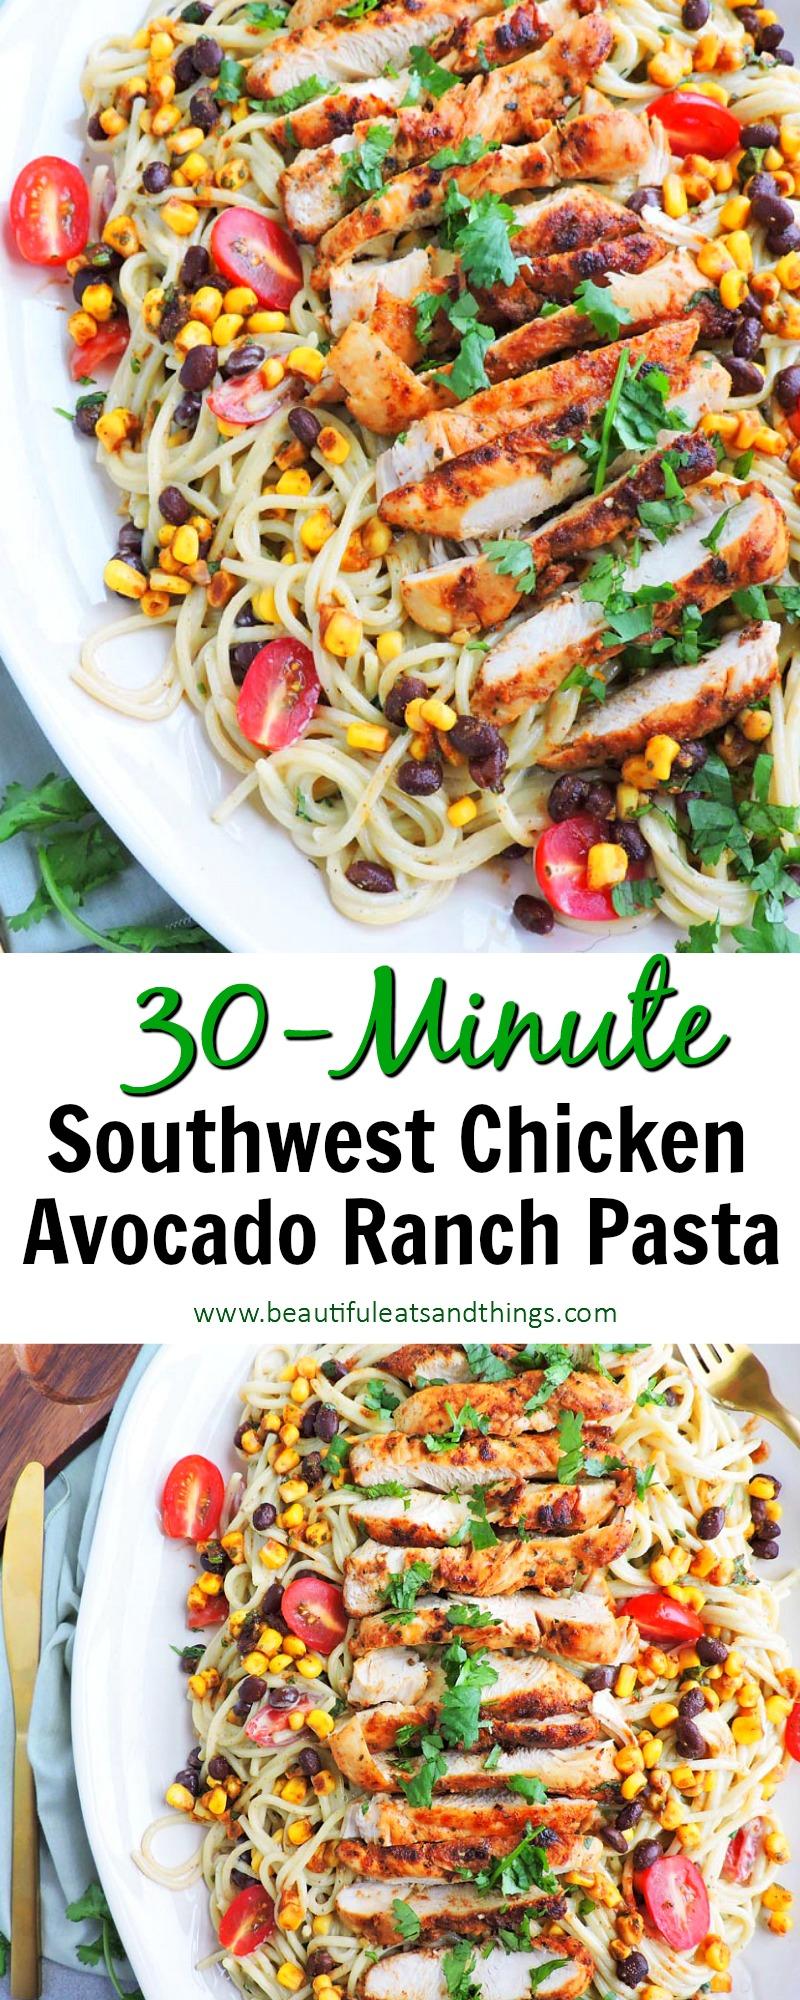 Southwest Chicken Avocado Ranch Pasta